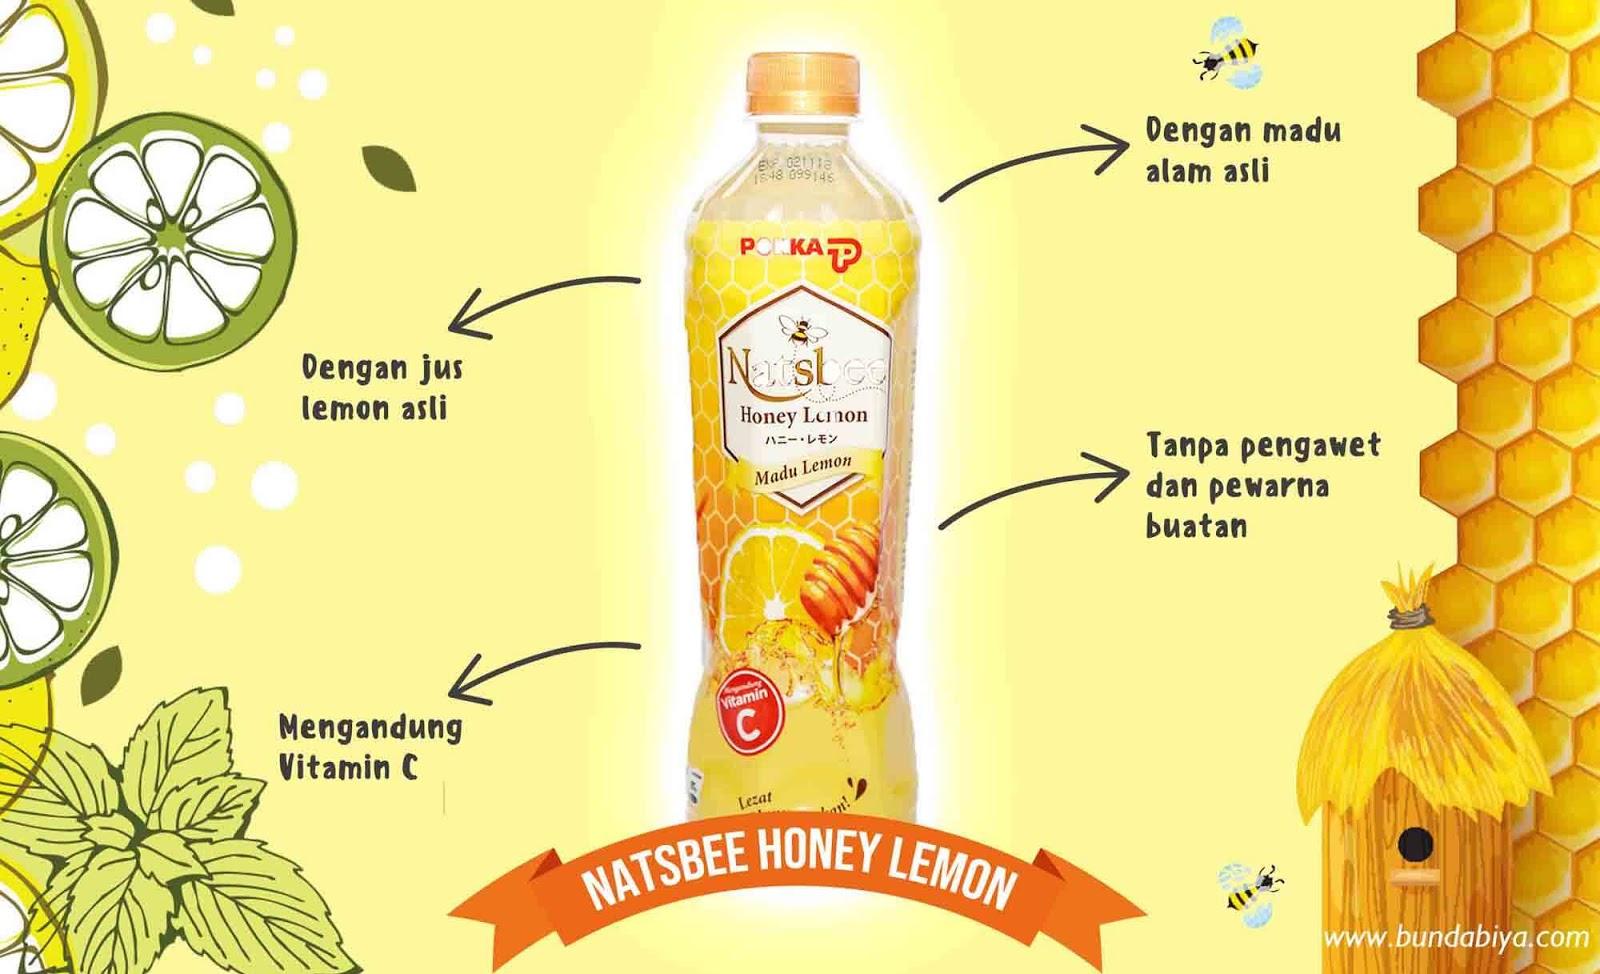 lomba blog natsbee, kompetisi blog natsbee, review natsbee honey lemon, natsbee honey lemon untuk ibu hamil, ibu hamil minum natsbee honey lemon, asik tanpa toxic